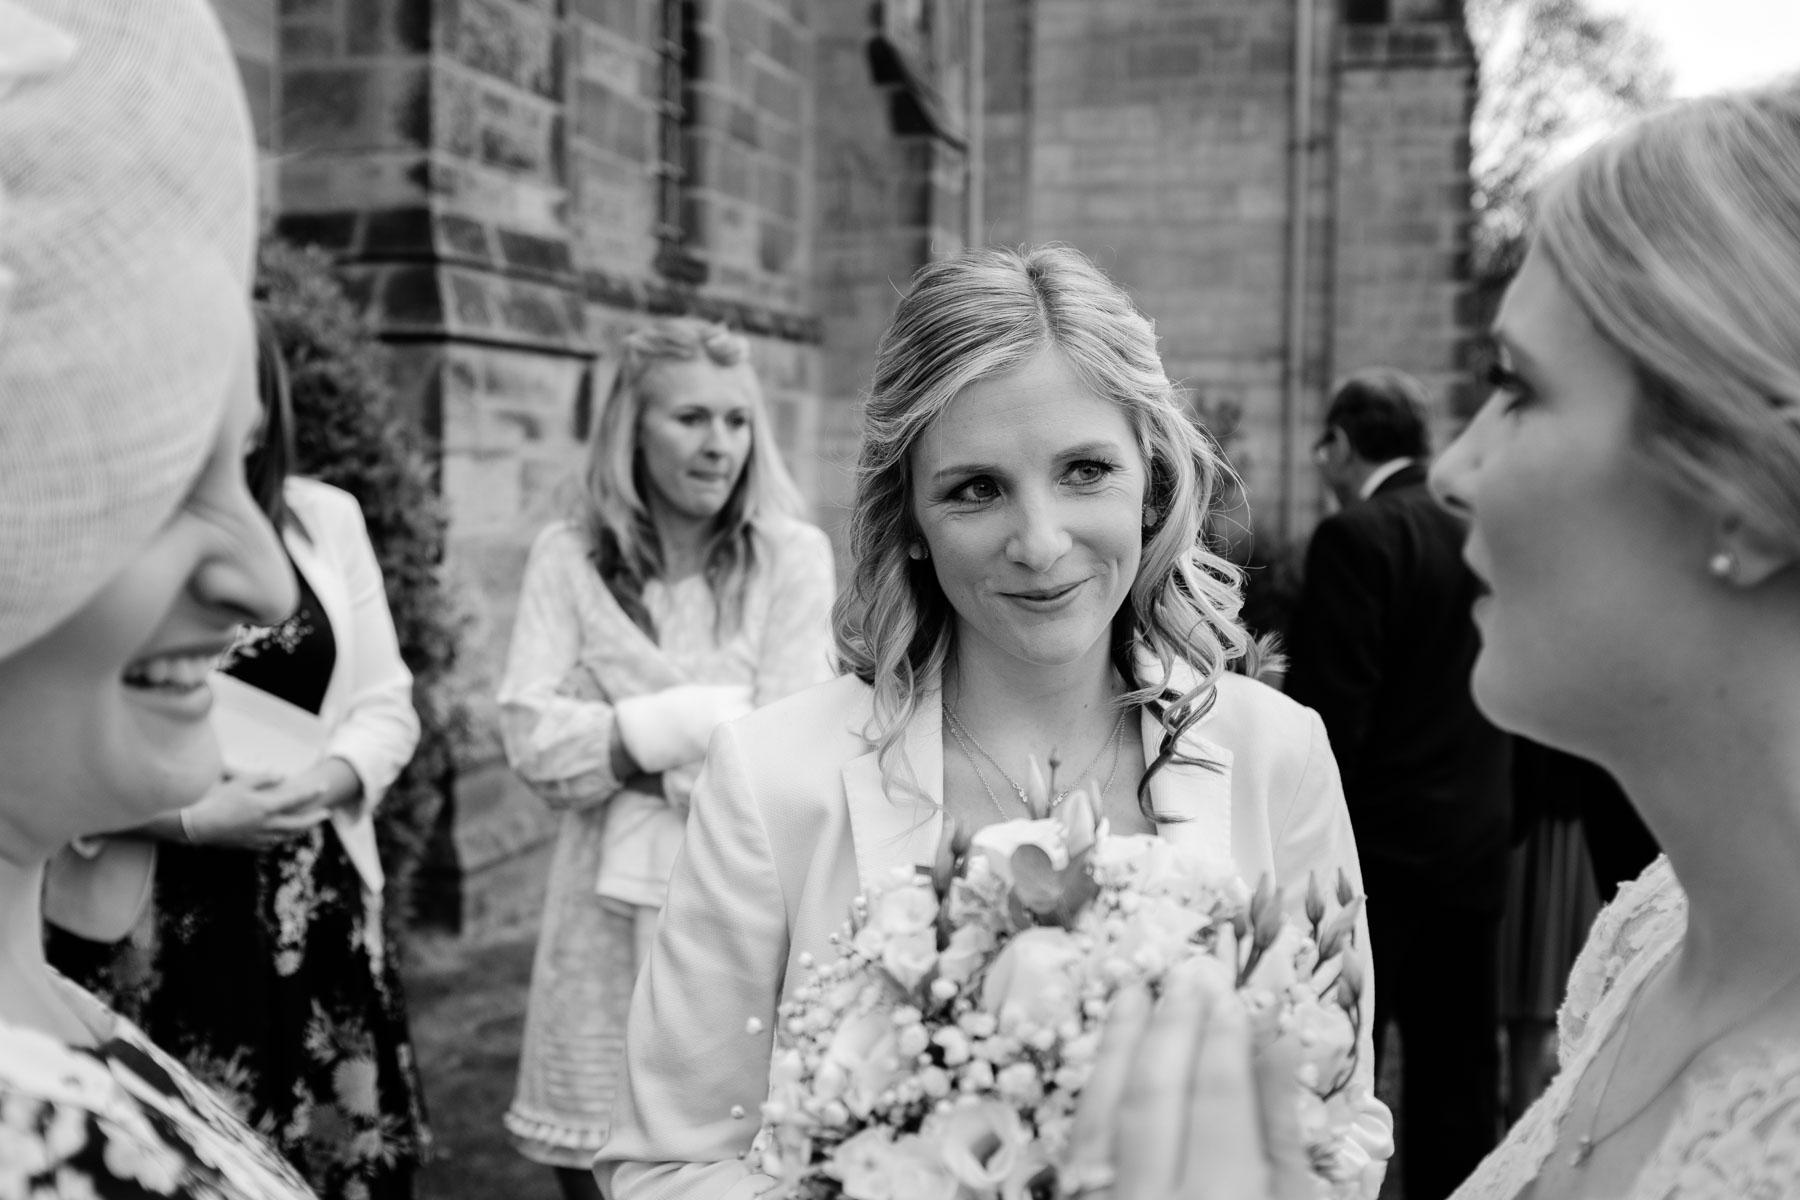 Crathorne Hall Wedding Photography - Jo & Paul (135).jpg